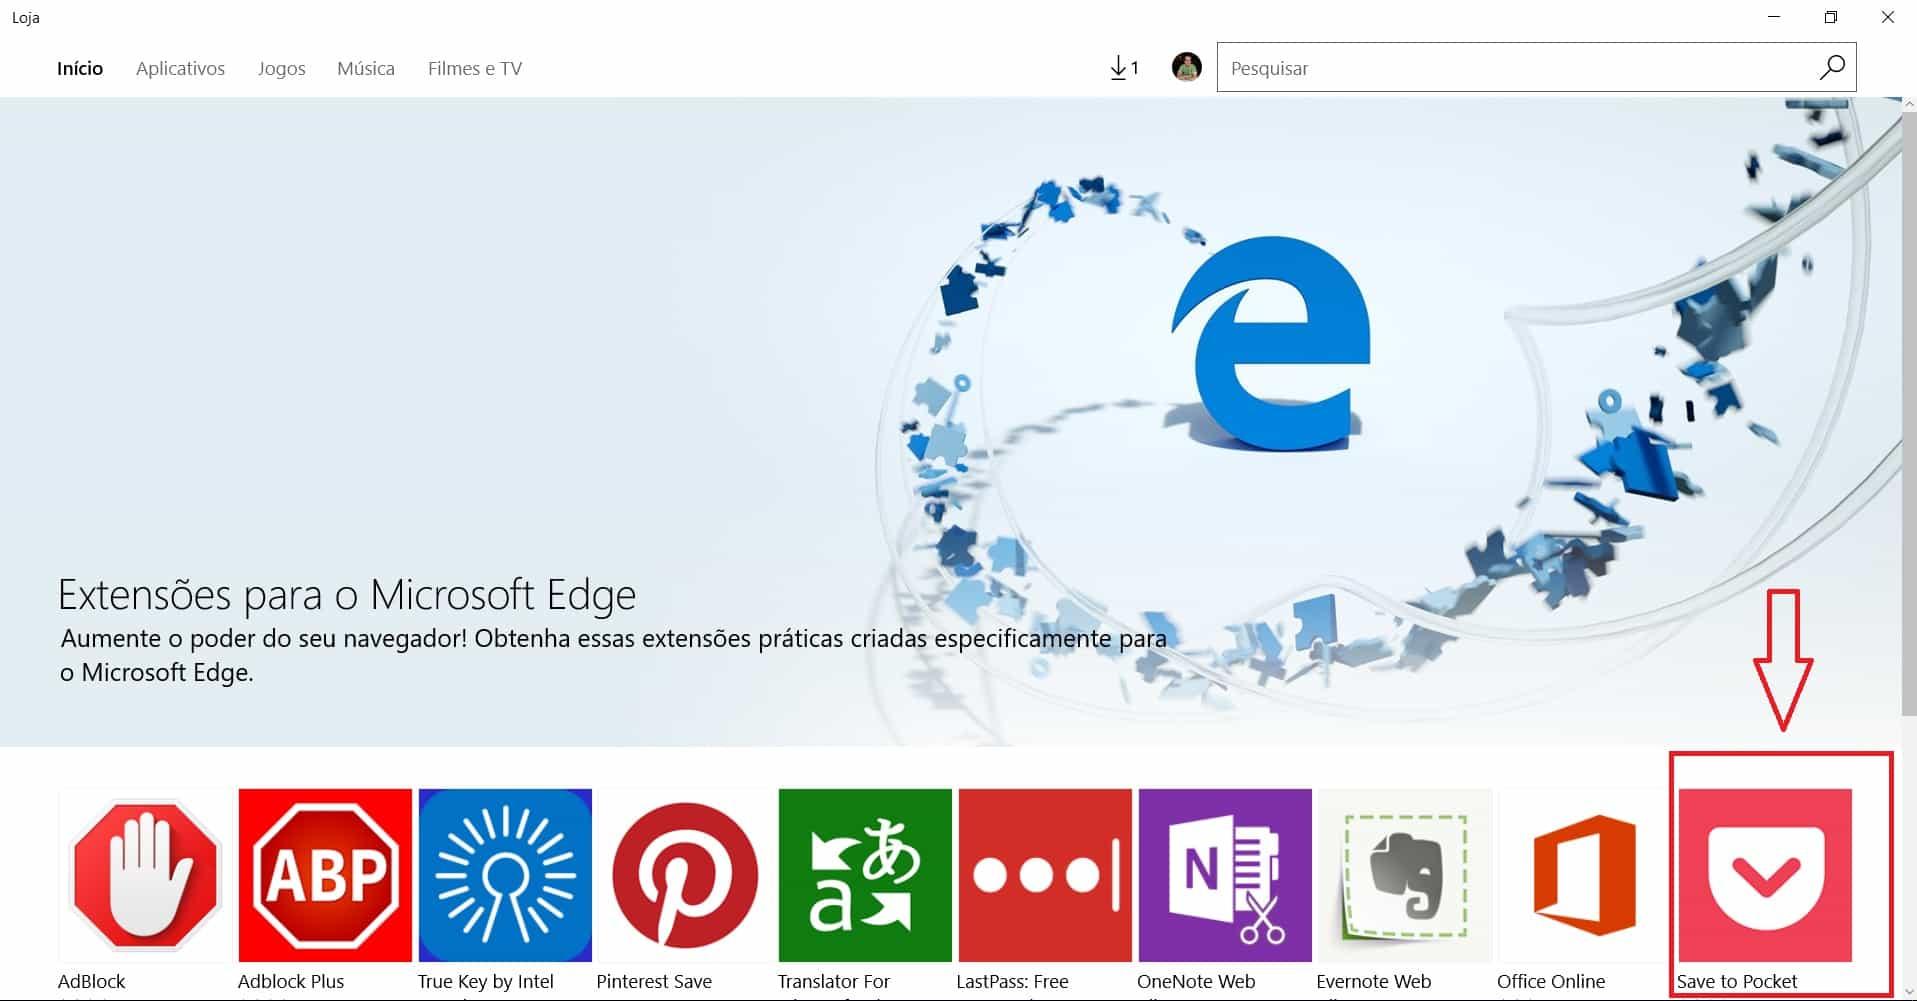 instalar-extensoes-no-microsoft-edge-escolher